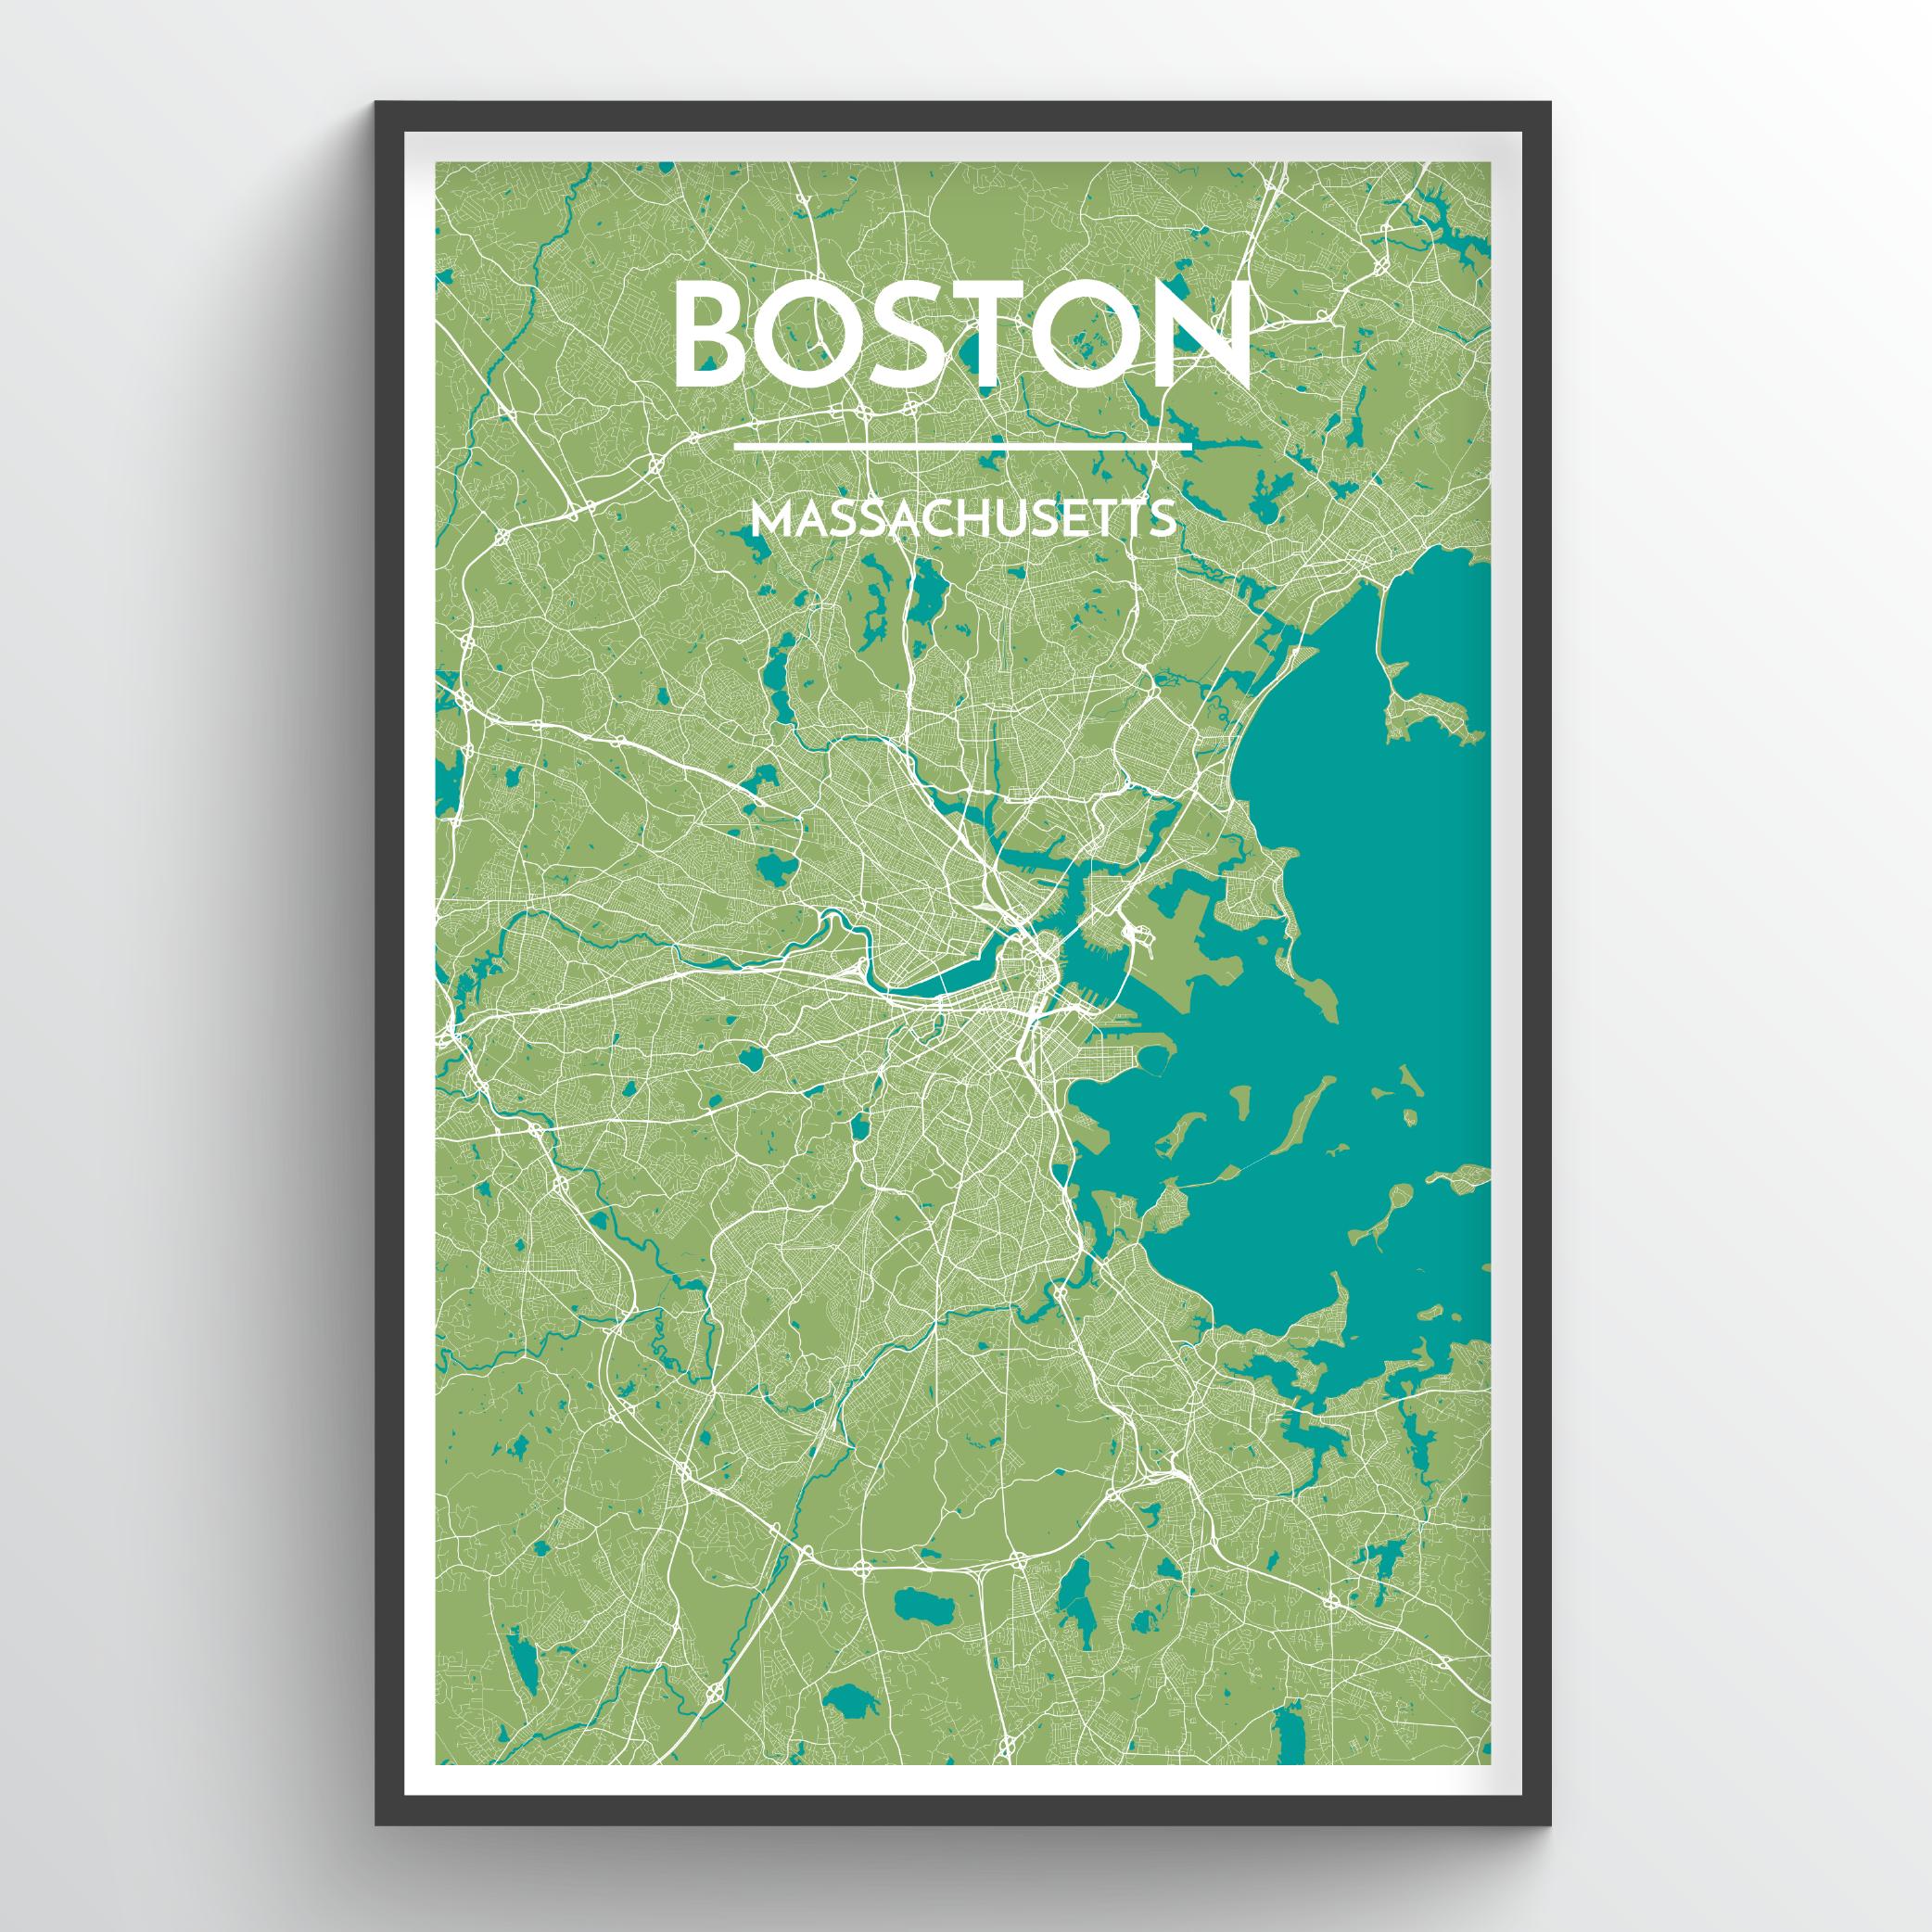 Boston City Map | Trada Marketplace